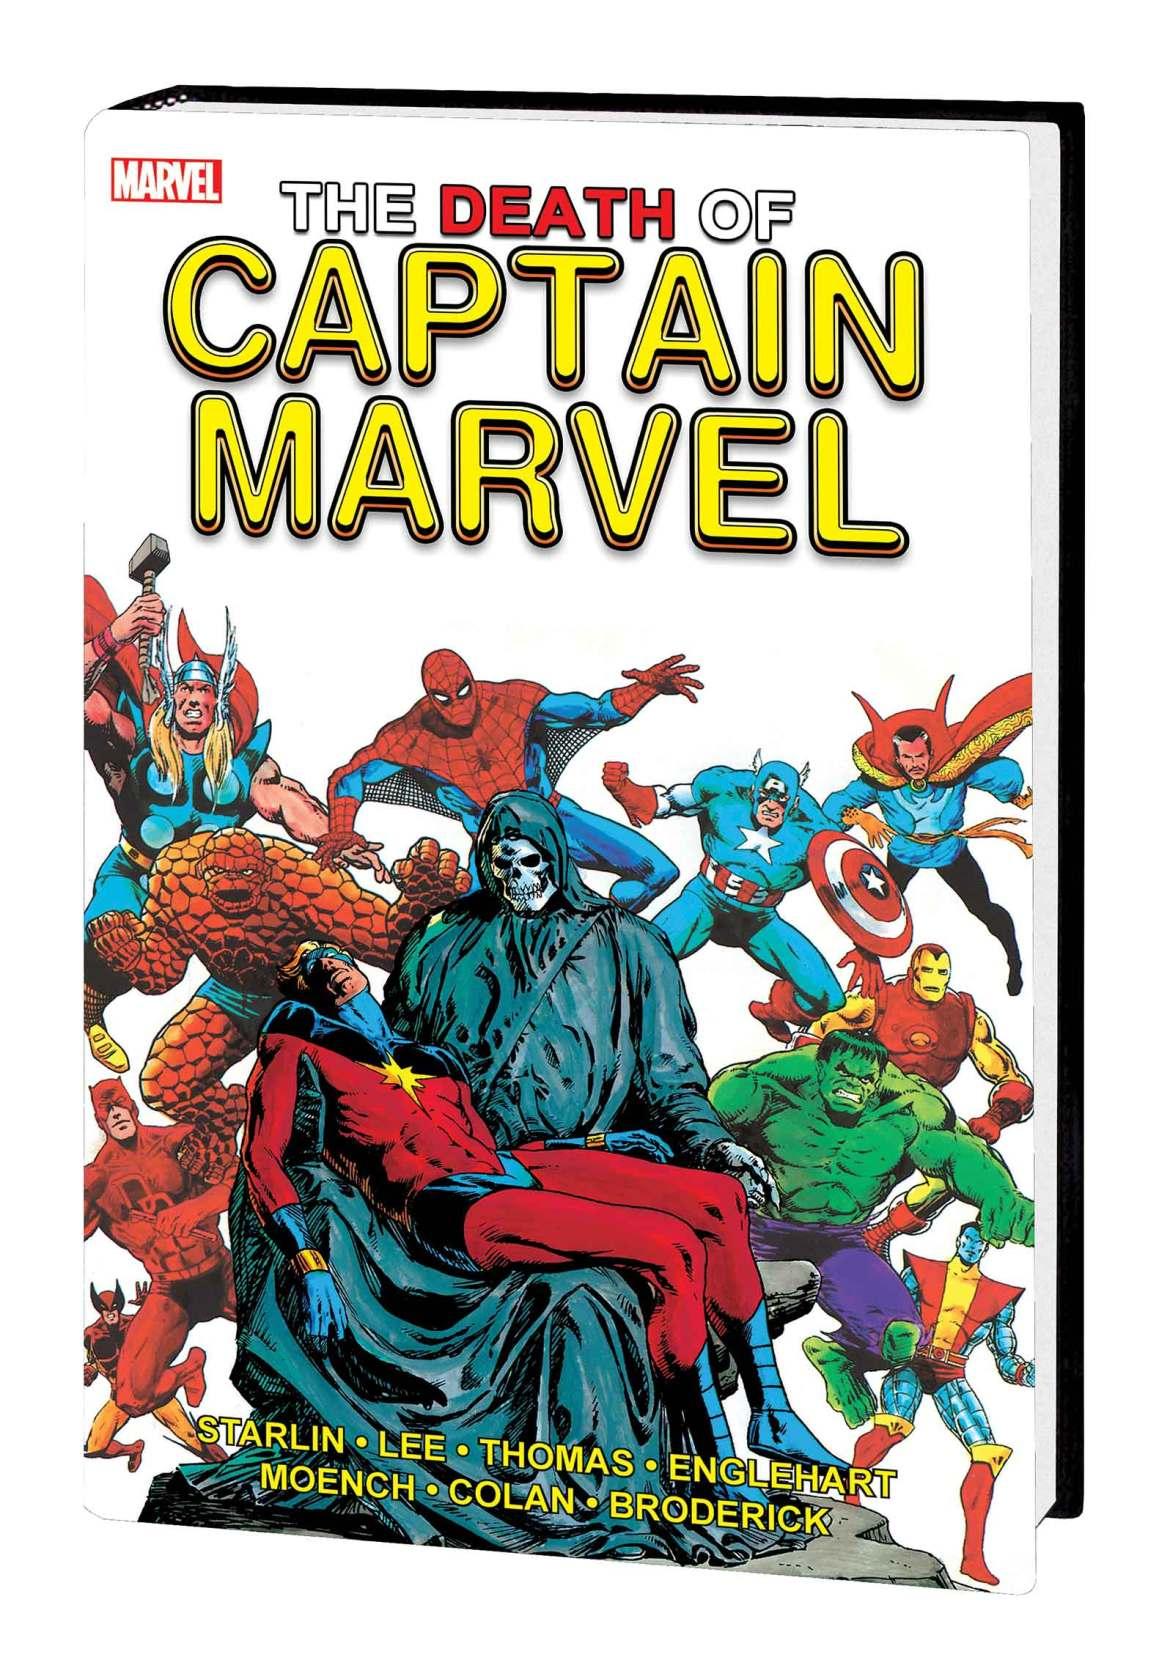 CAPT_MARVEL_DEATH_GE_HC-1 Marvel Comics May 2021 Solicitations